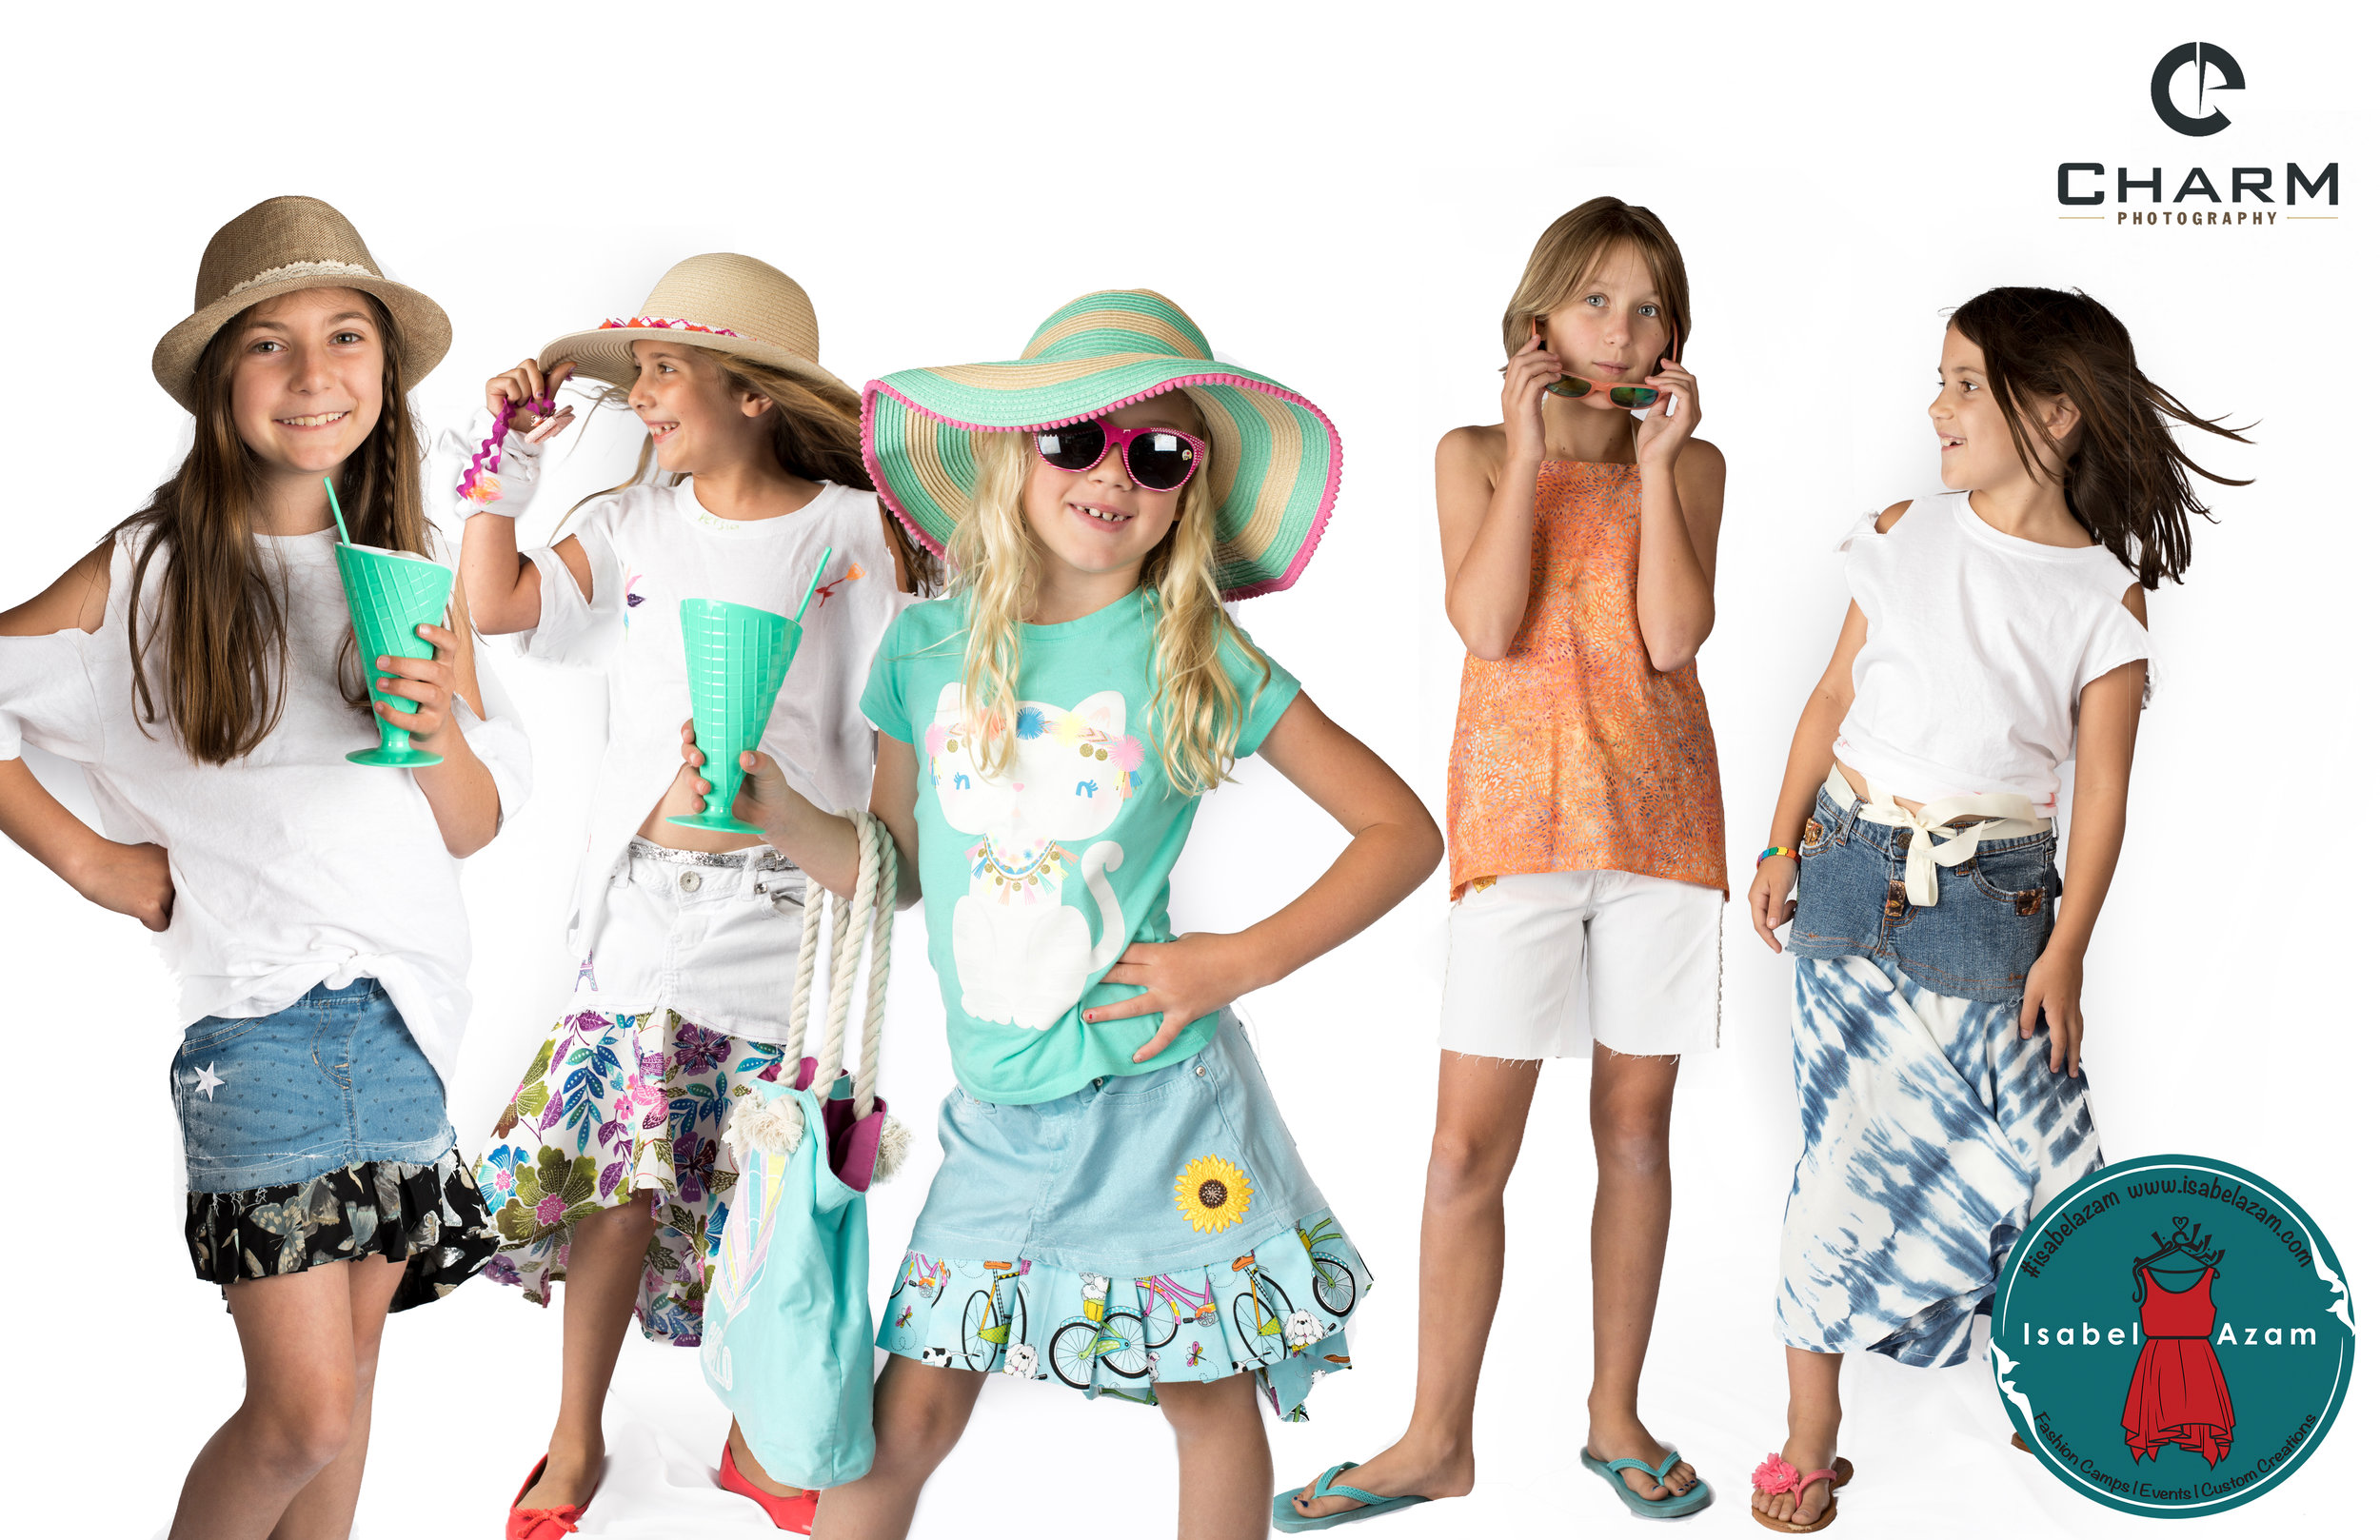 Fashion Camp fun - Photoshoot by Charm Photography